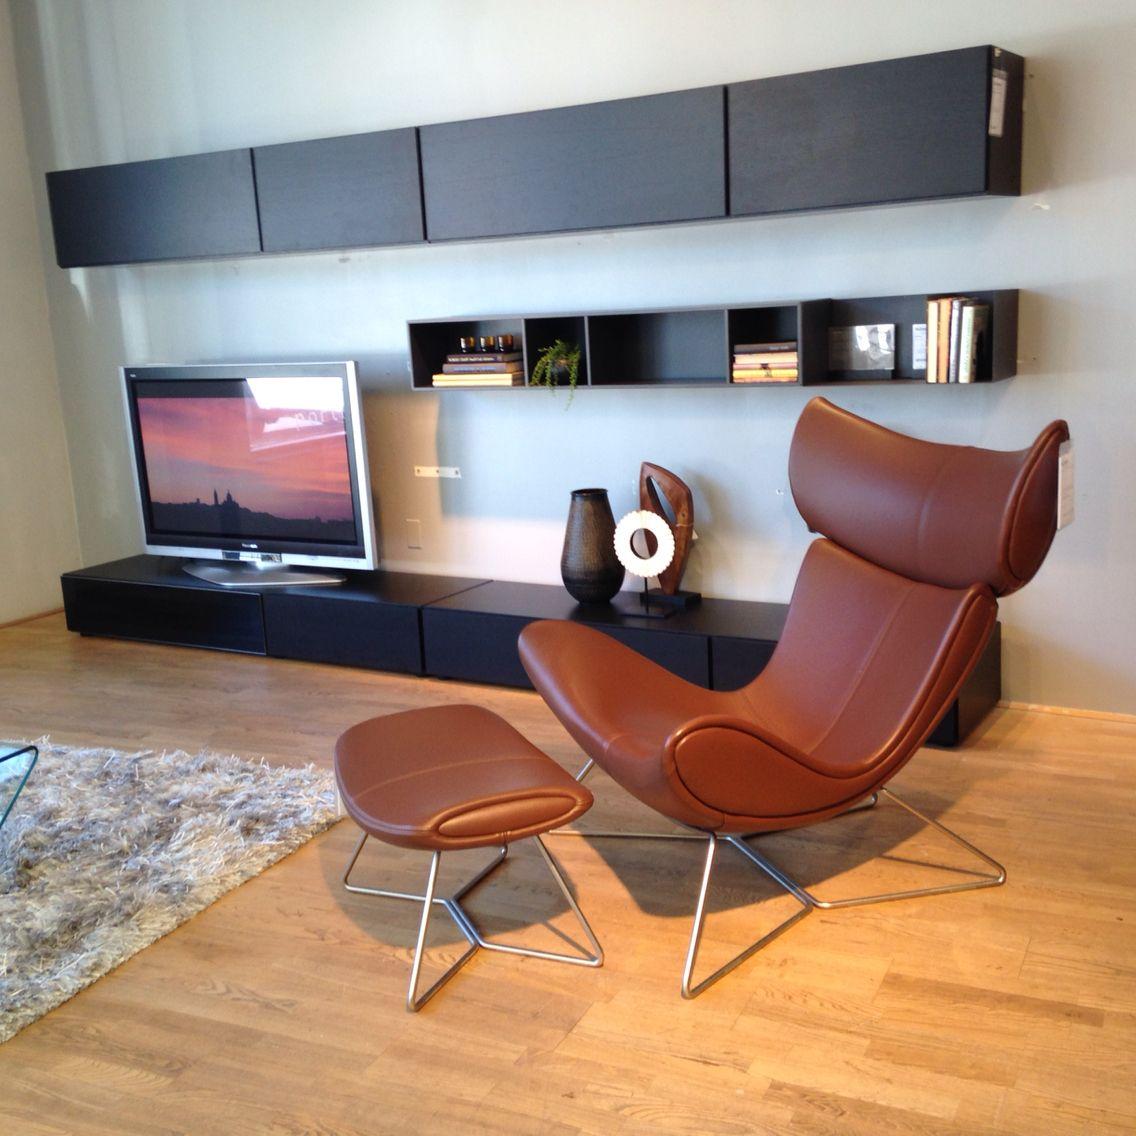 Boconcept Imola Chair And Lugano Wall System Design Living